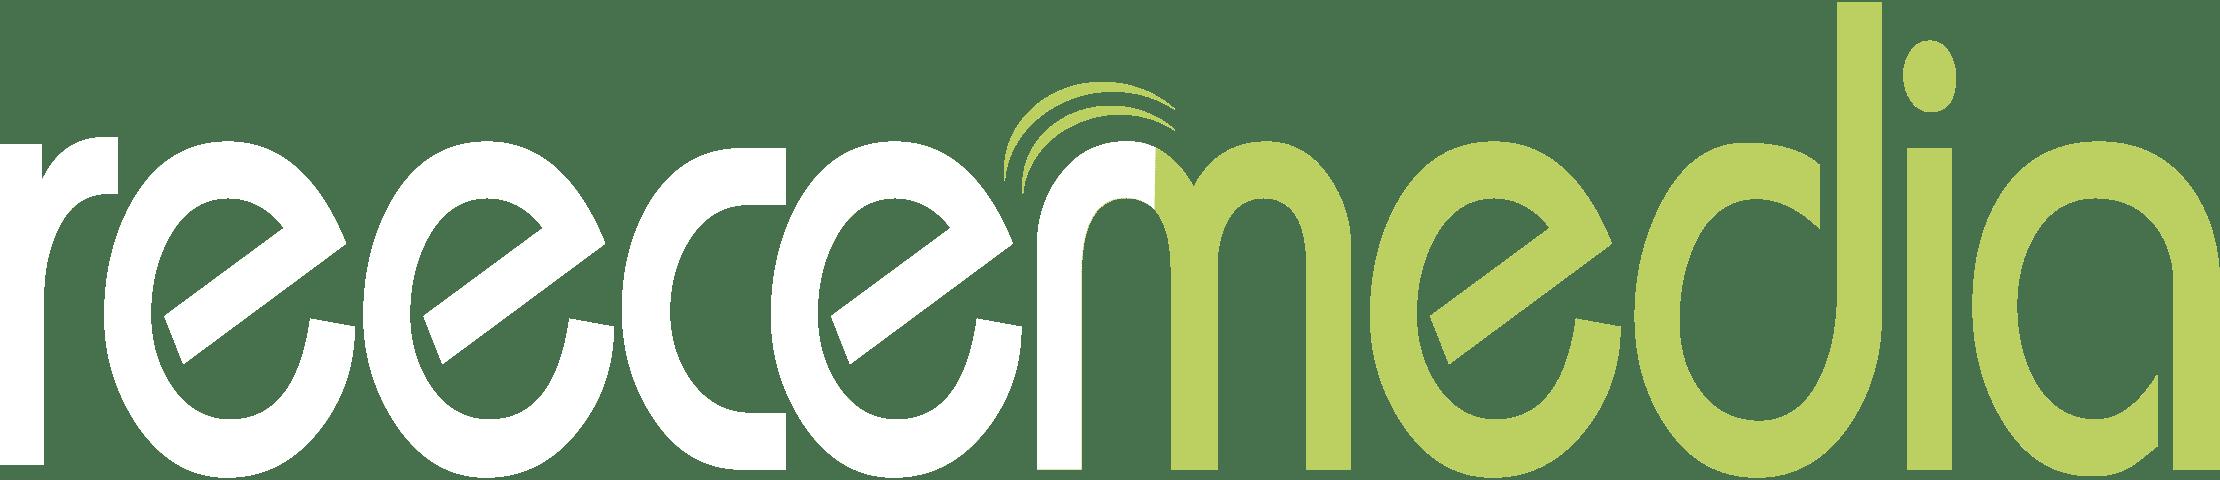 ReecerMedia